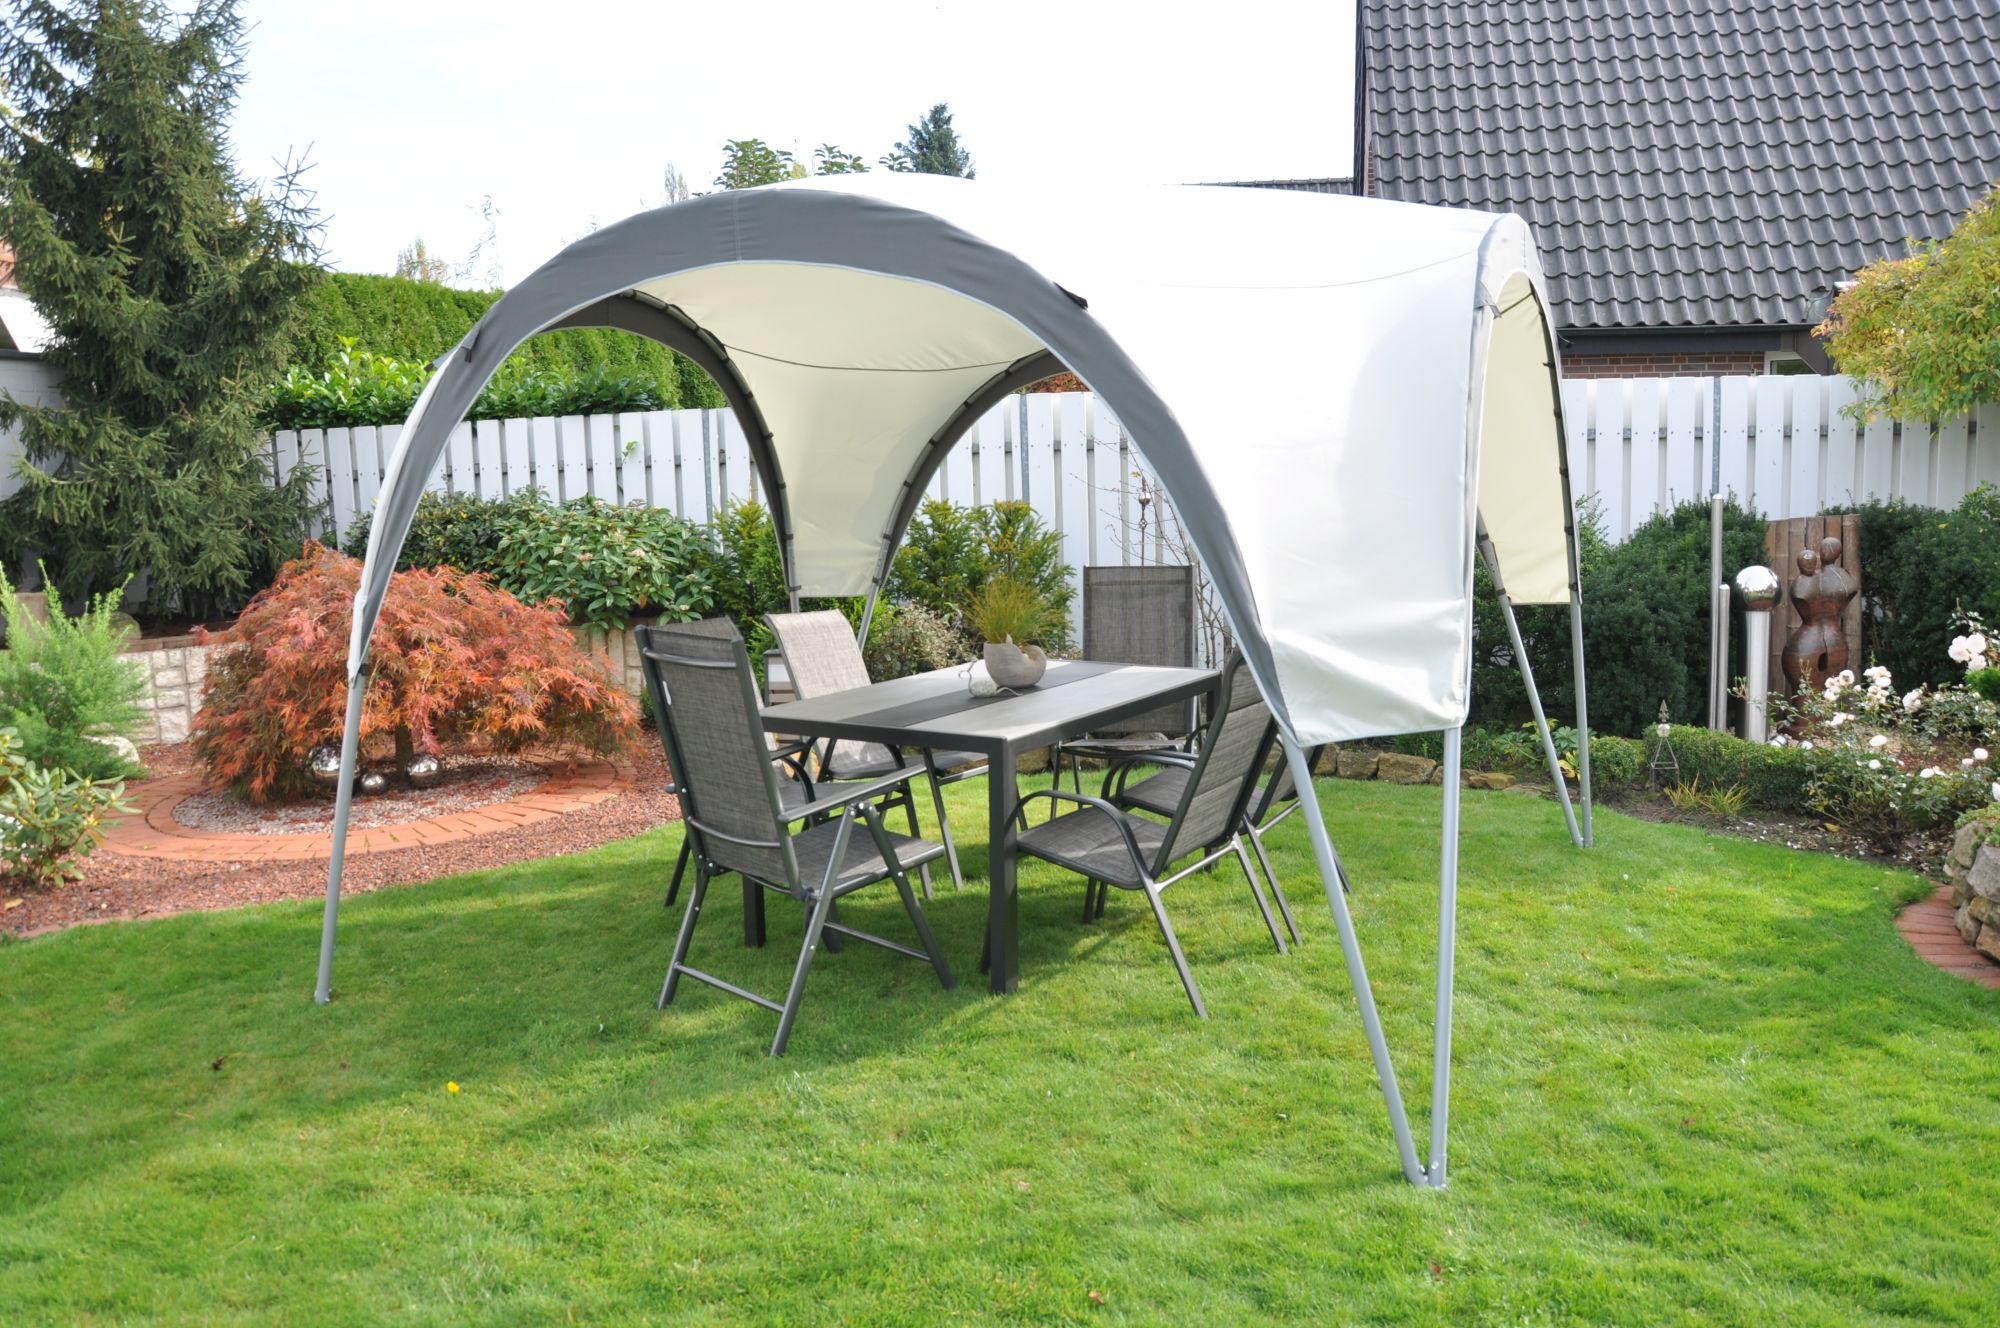 Full Size of Leco Sonnendach Ultra Pavillon Pergola Terrasse Garten Berdachung Gartenüberdachung Garten Gartenüberdachung